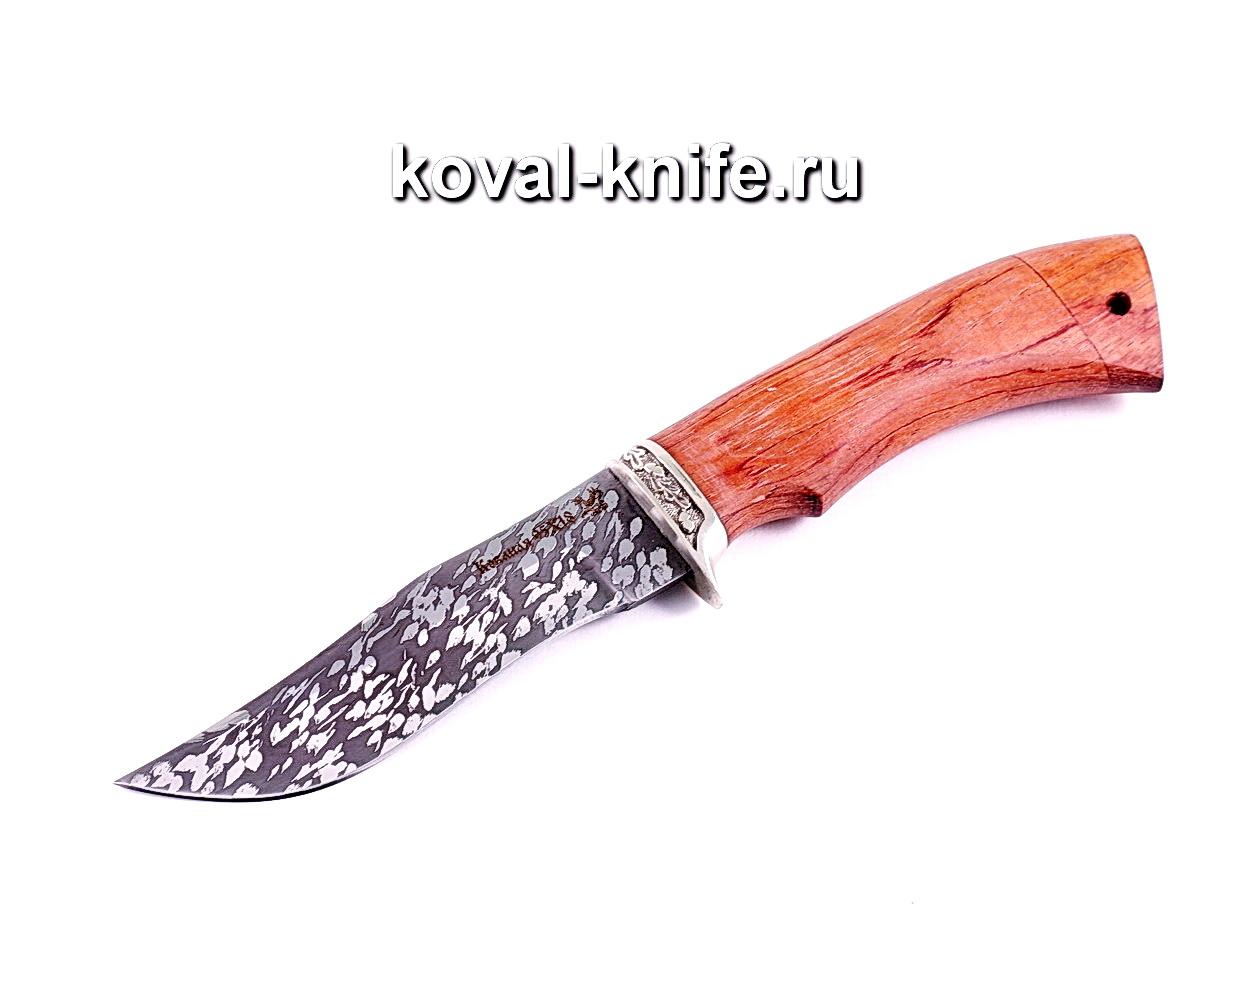 Нож Охотничий (сталь 95х18), рукоять бубинга, литье A008